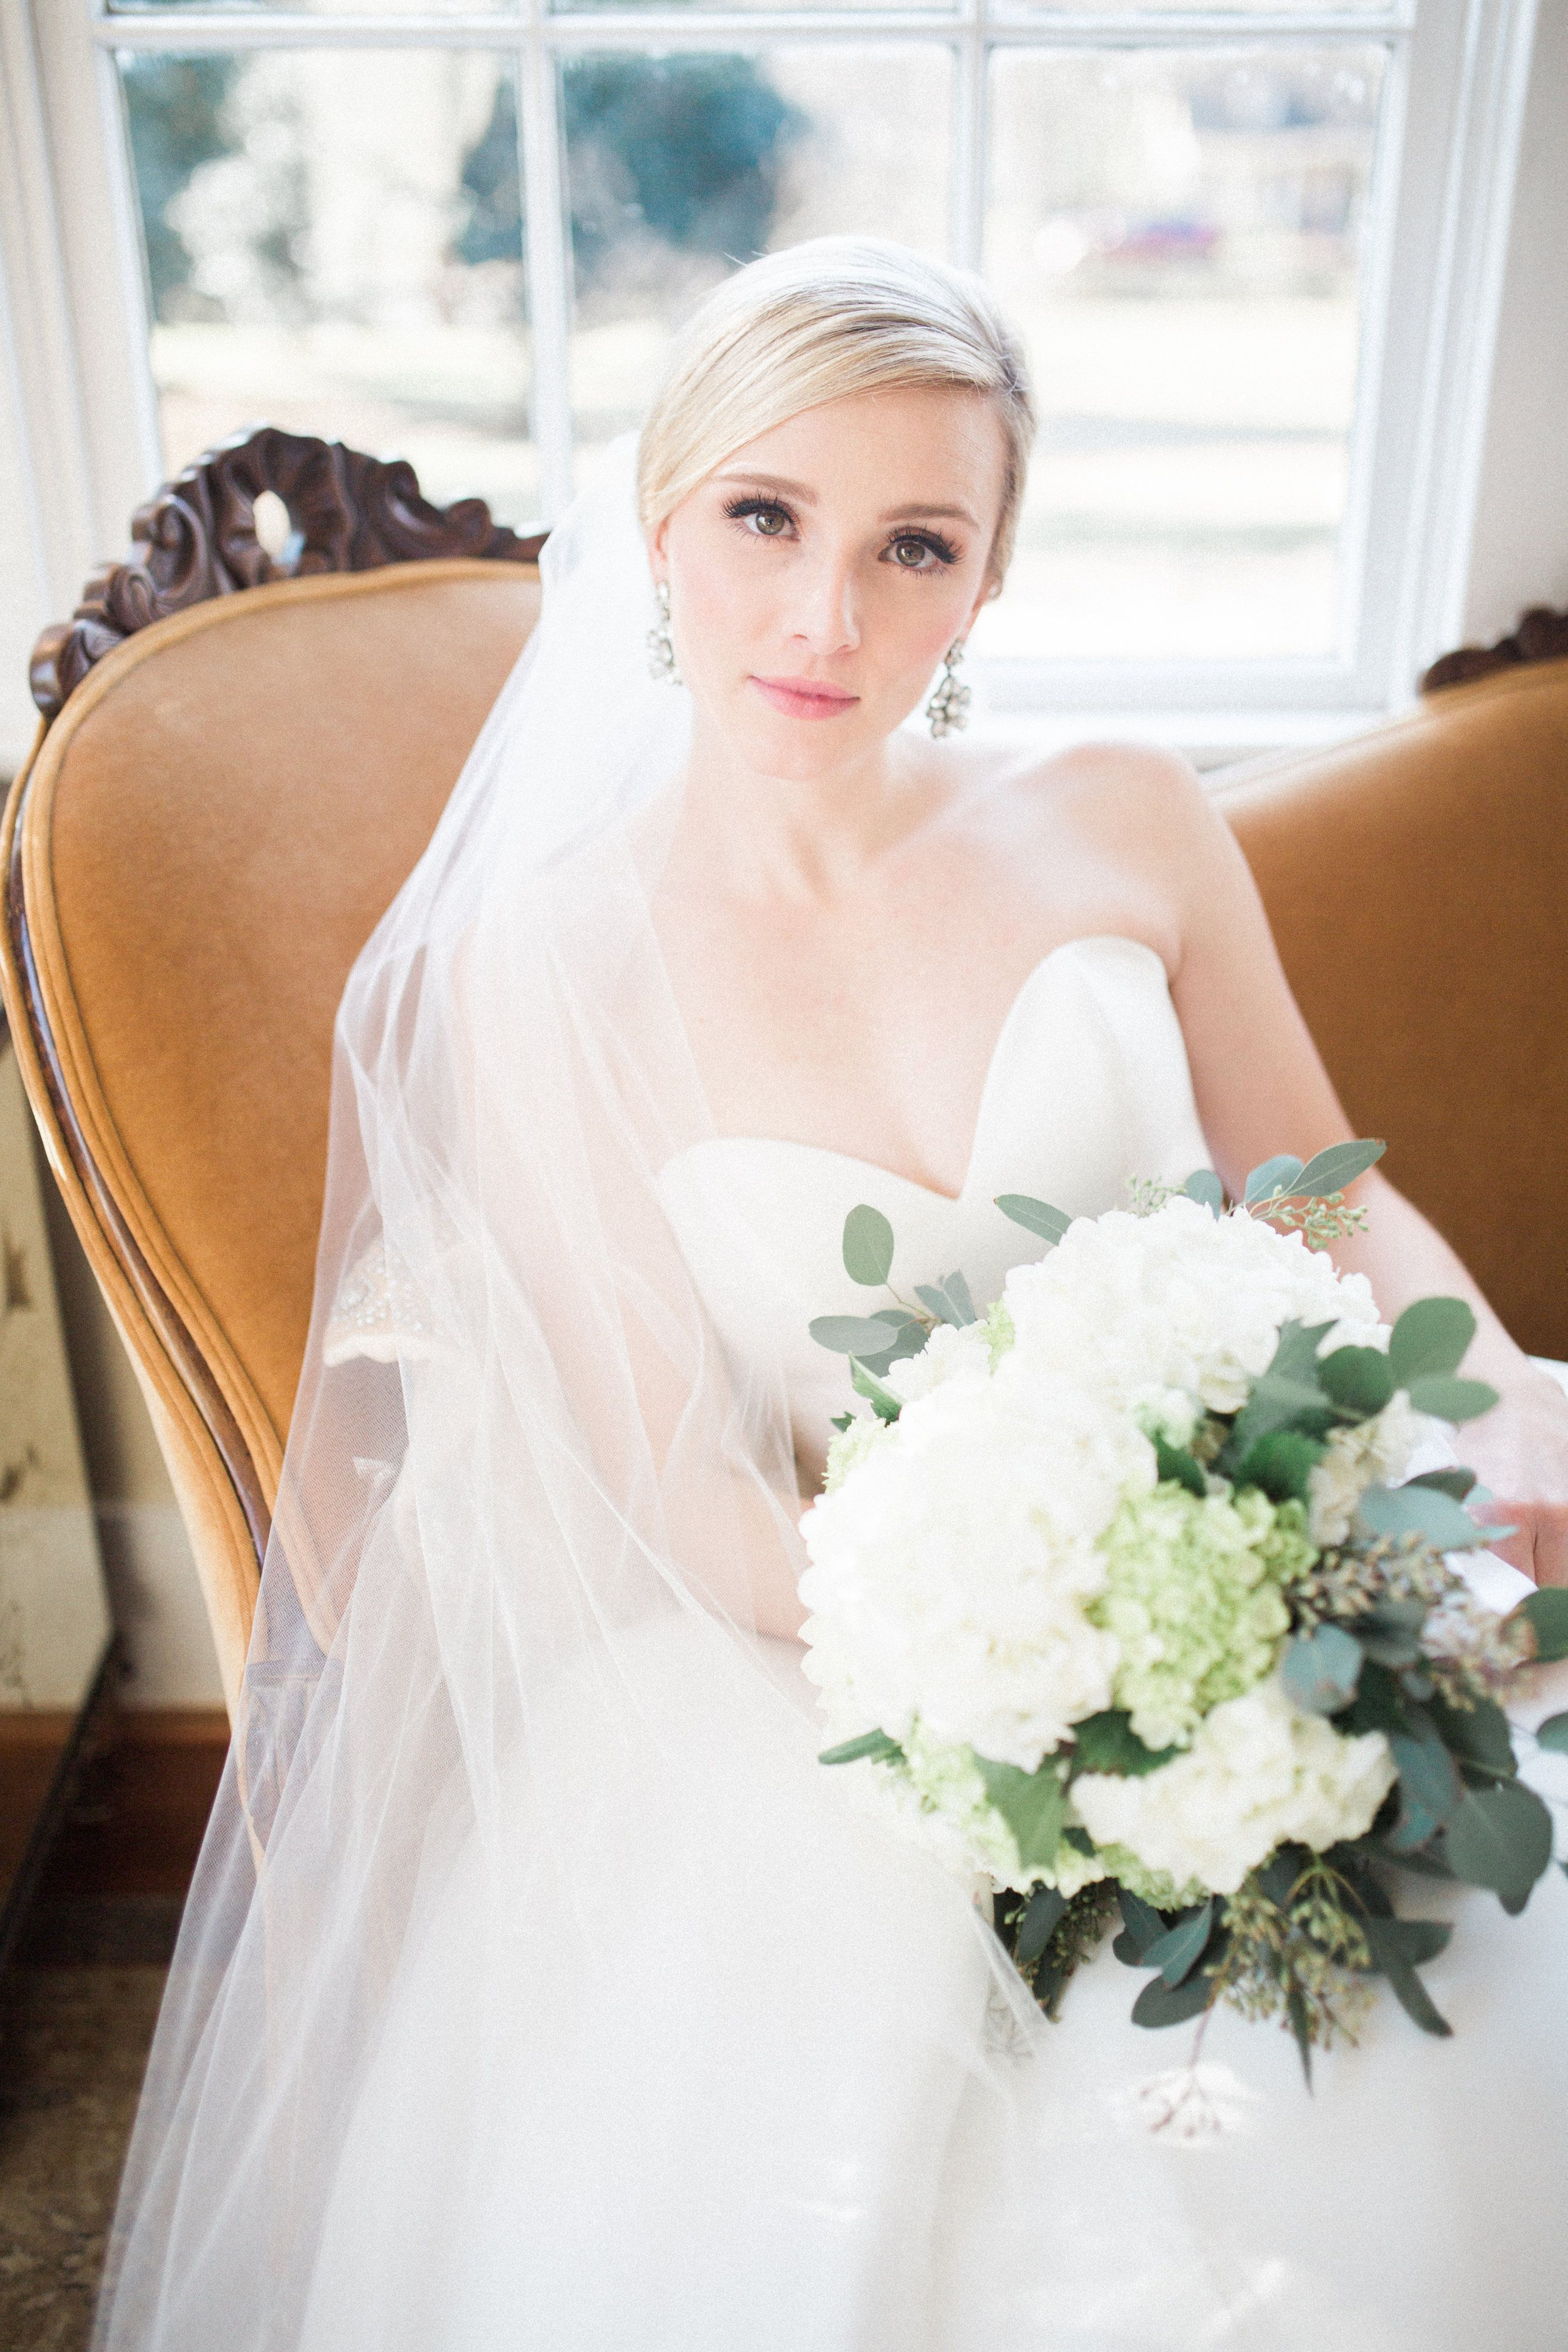 Wedding Dress At Wedding Angels Bridal Boutique Elegant Wedding Dress Strapless Wedding Dress Ballgown Wedding Dress Satin Wedding Dress Atlanta Bridal